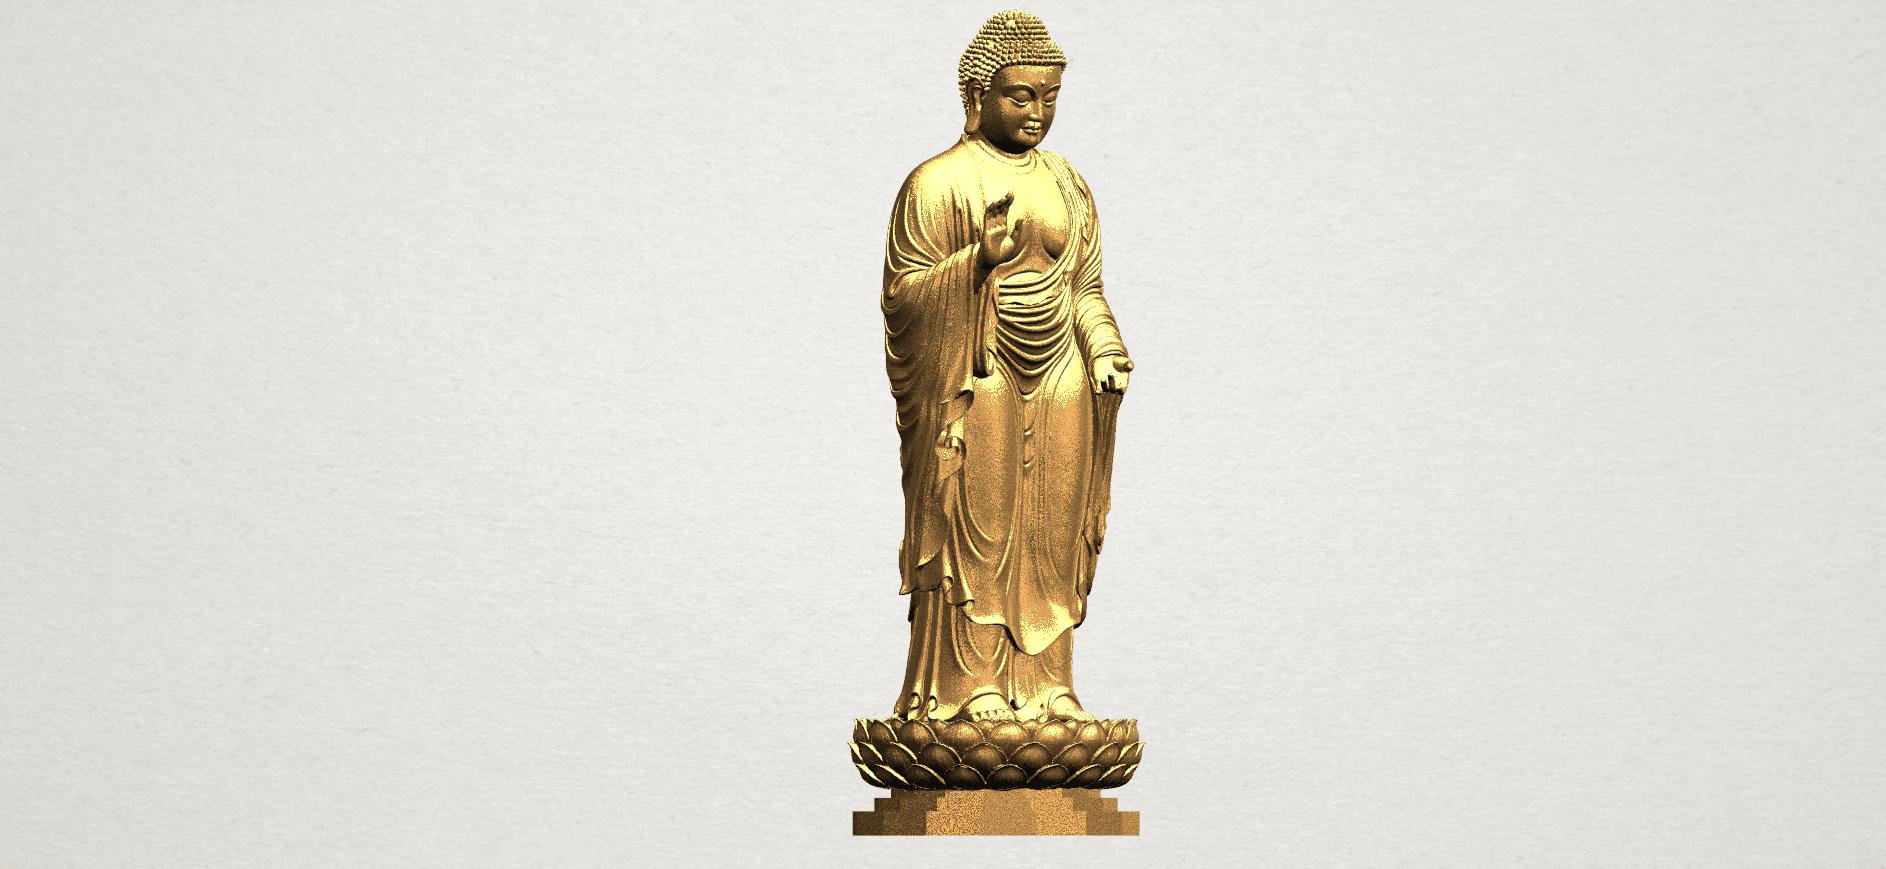 Gautama Buddha Standing (ii) A08.png Download free STL file Gautama Buddha Standing 02 • 3D printer design, GeorgesNikkei